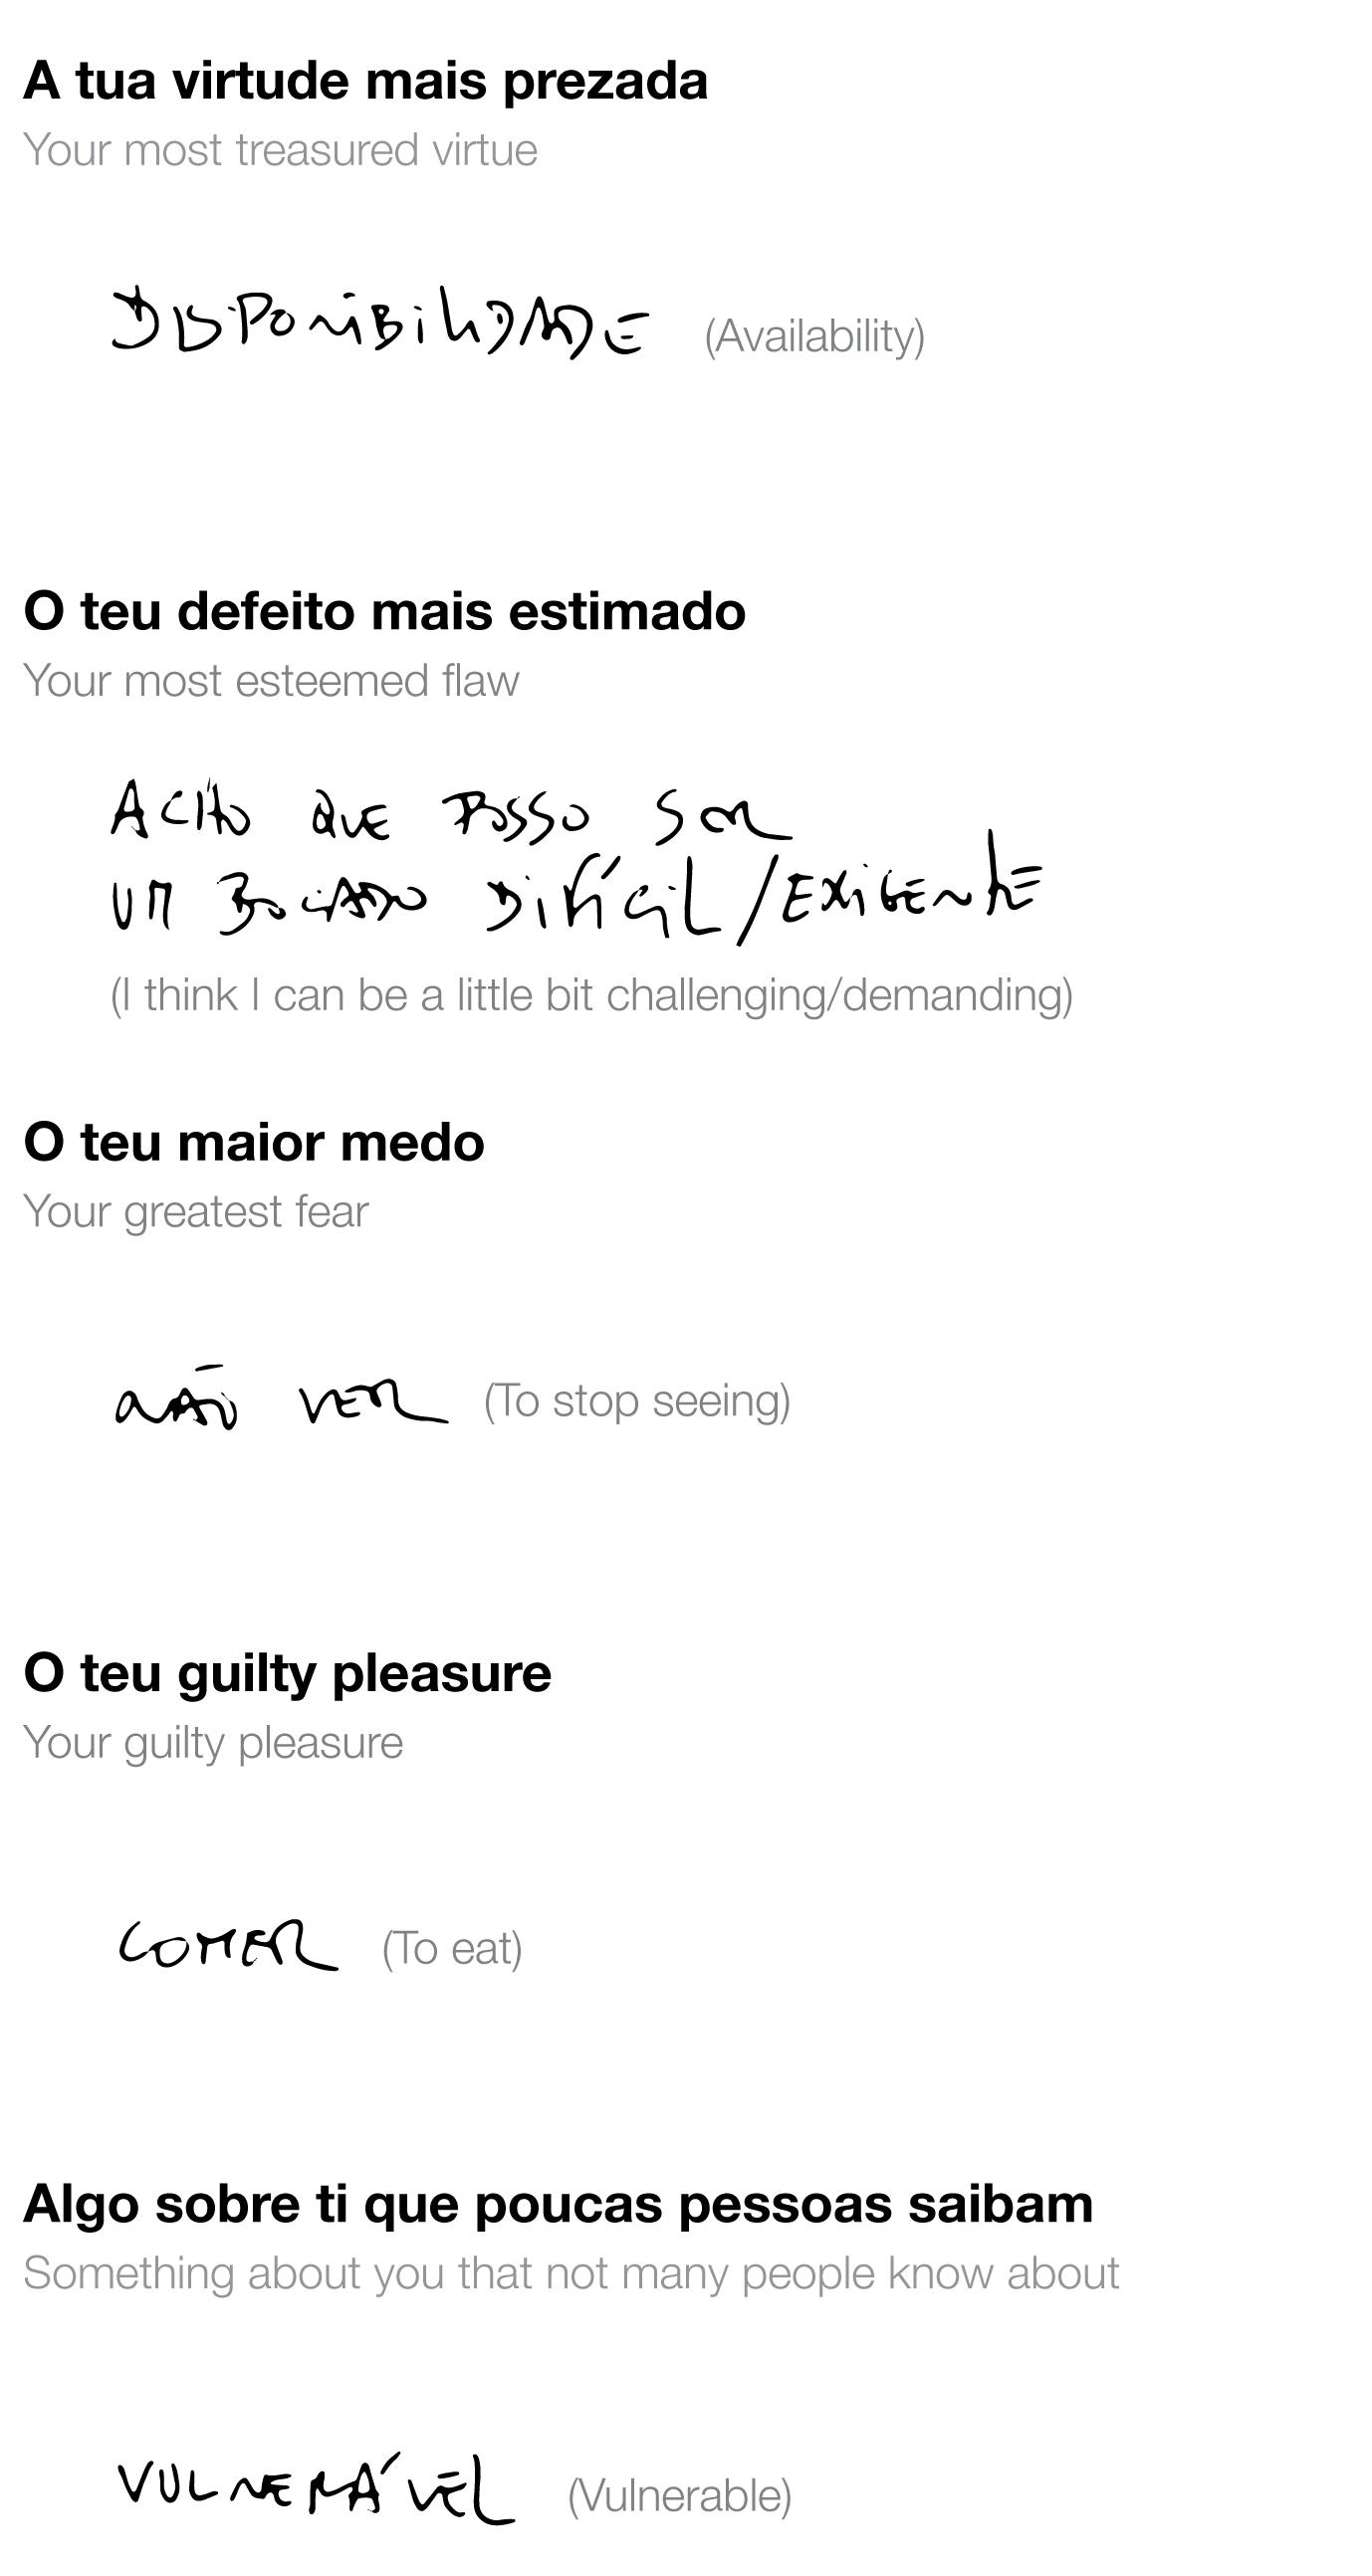 perguntas_gonçaloprudencio-01.png